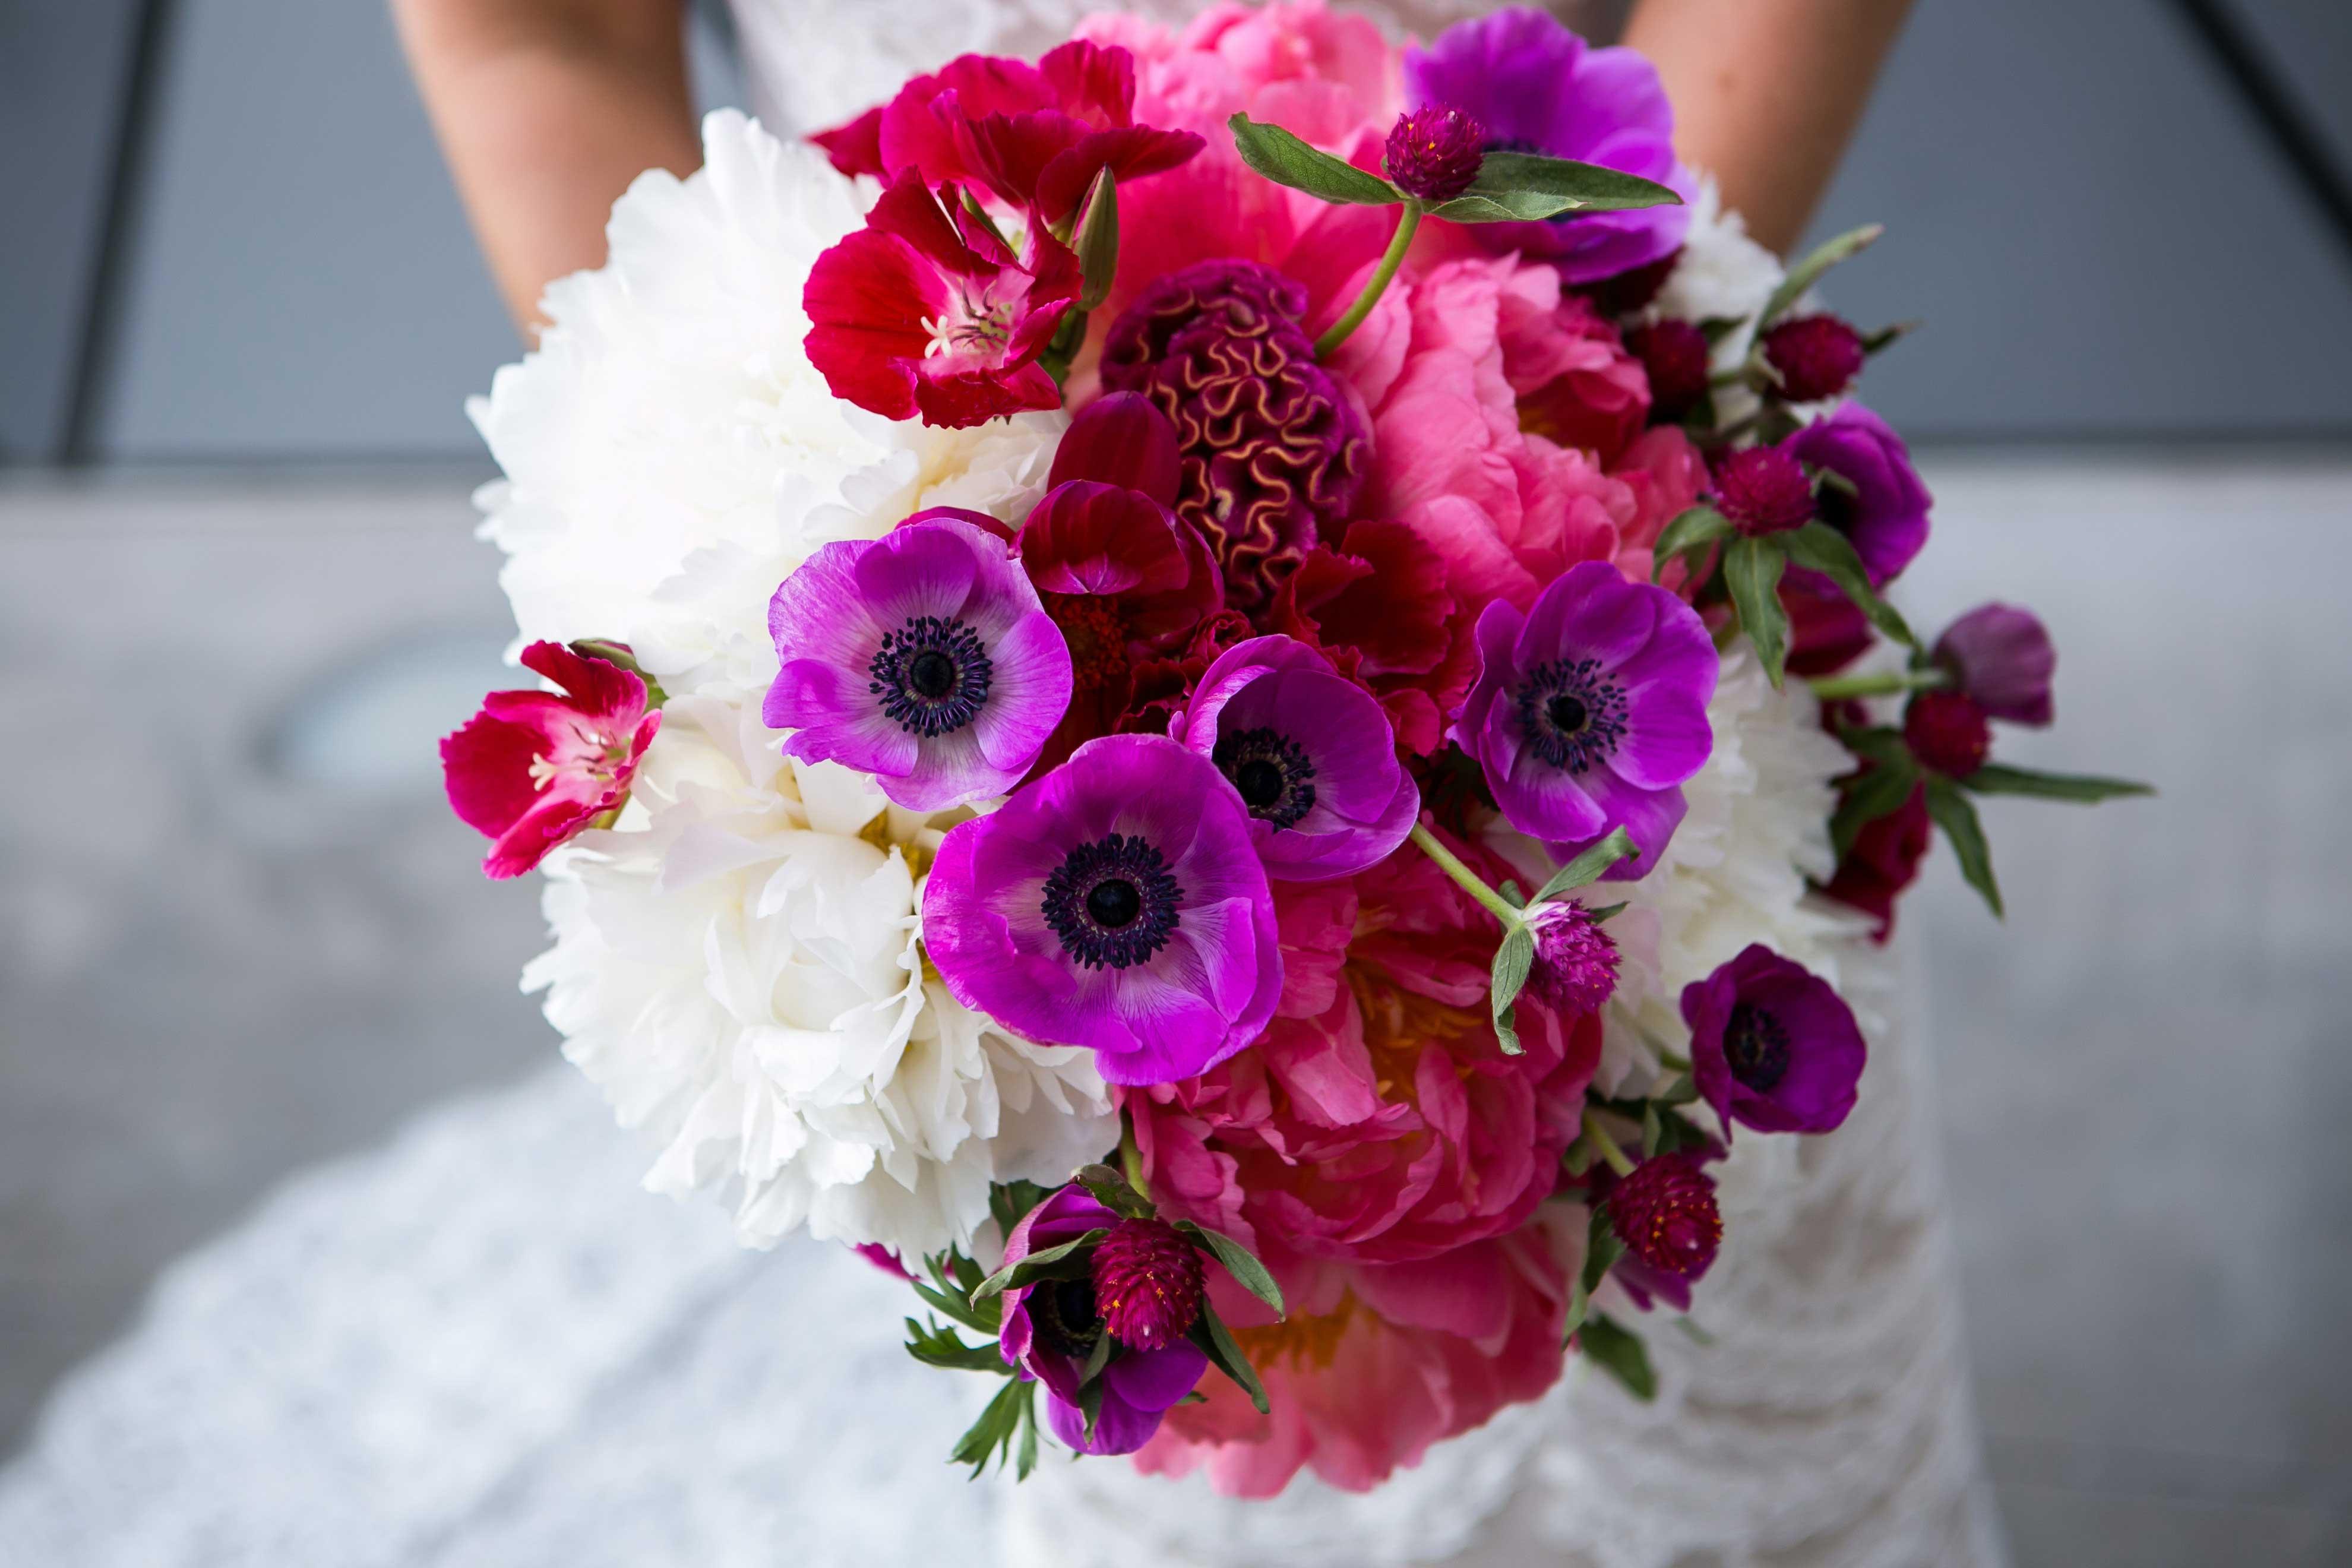 Wedding Color Palette Ideas: Dark & Moody Hues